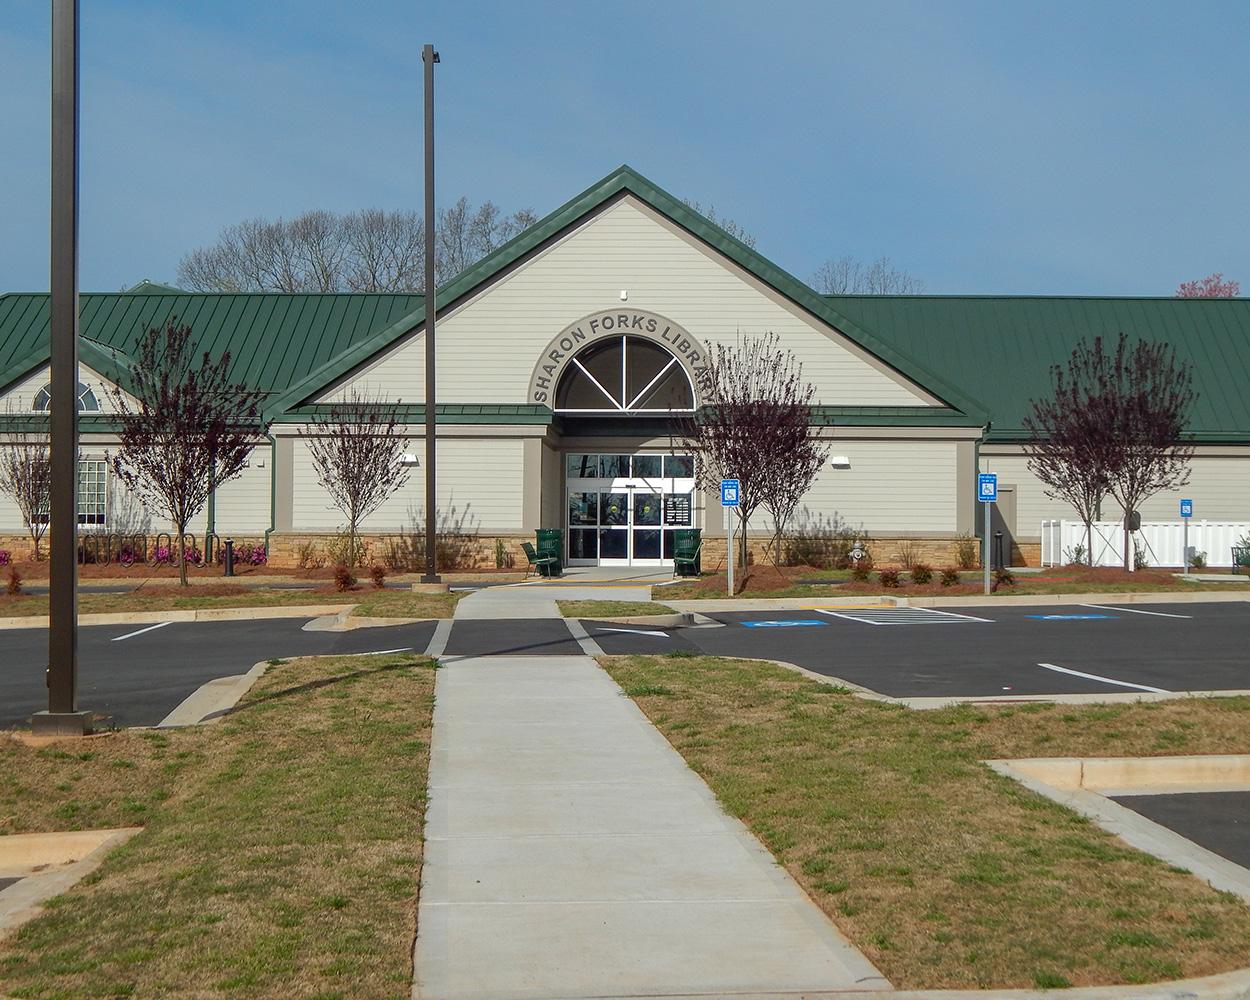 Sharon Forks Library Renovation | Cumming, GA